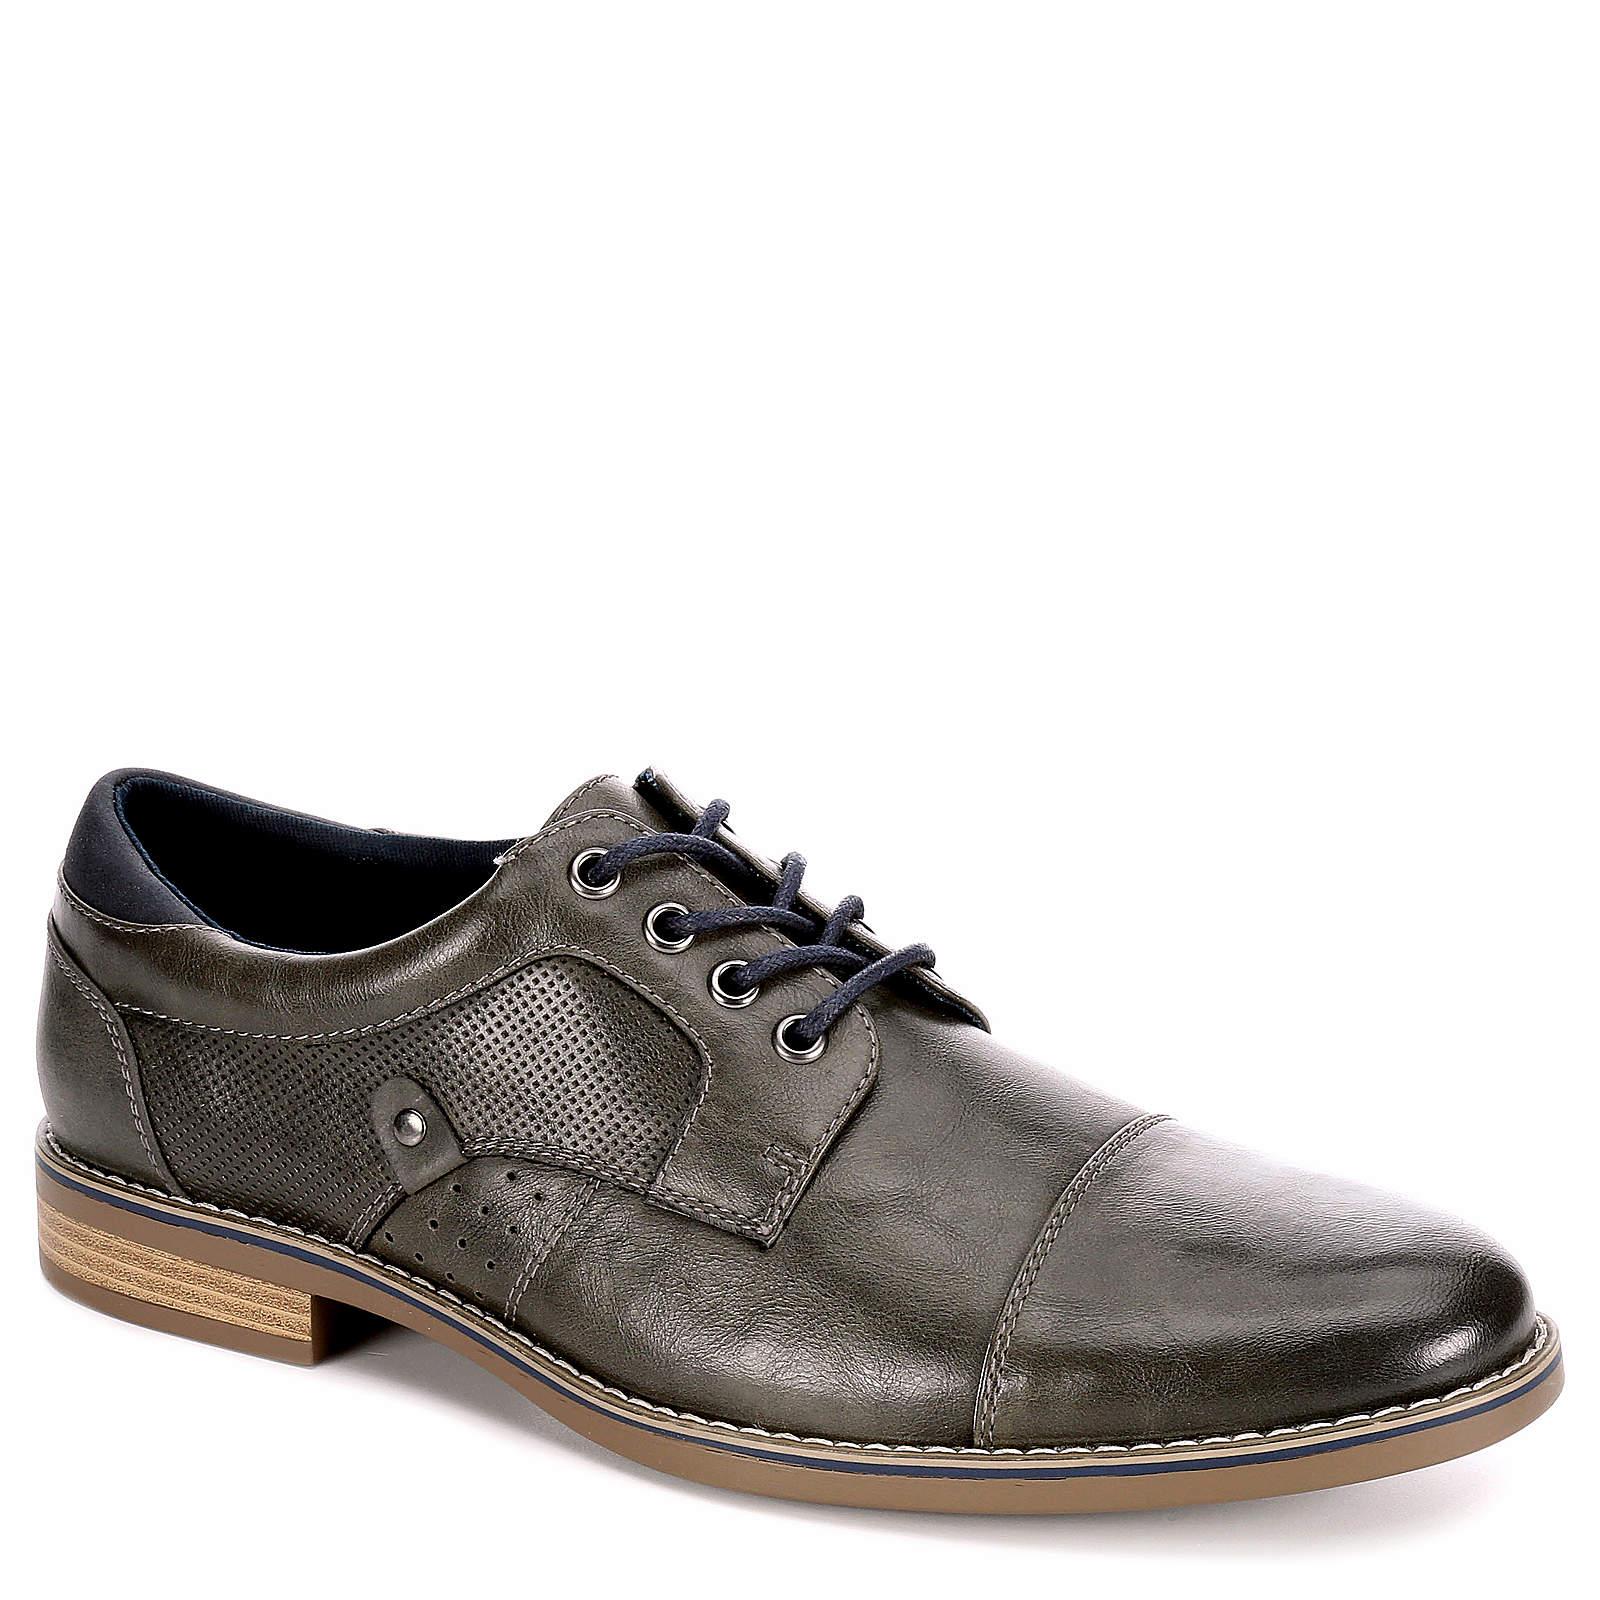 Restoration Mens Justin Lace Up Cap Toe Oxford Shoes Grey